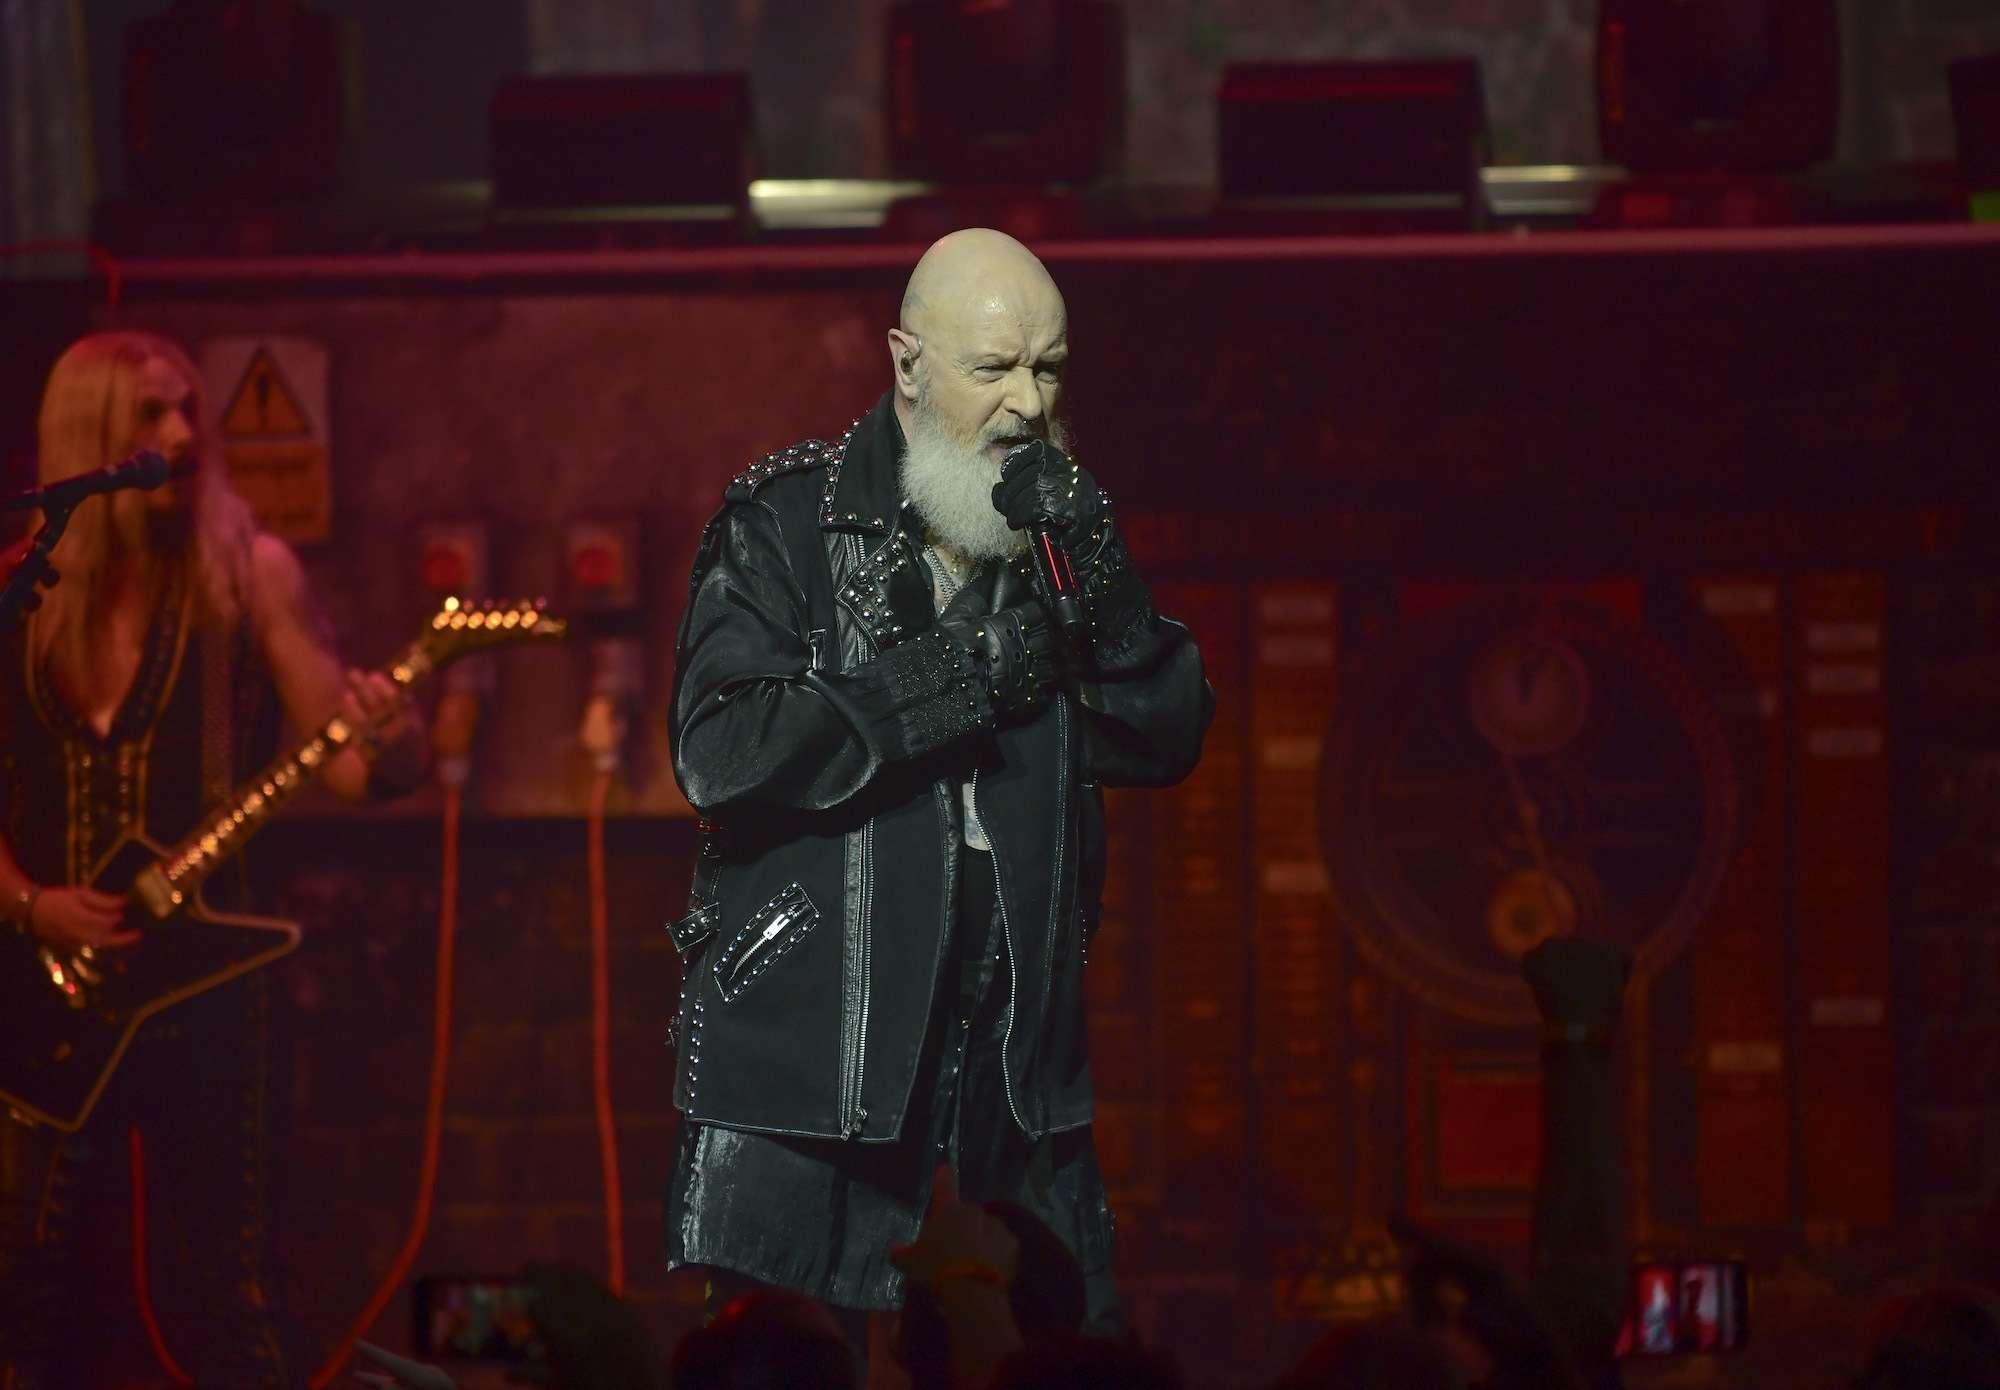 Judas Priest Live at Rosemont Theatre [GALLERY] 14